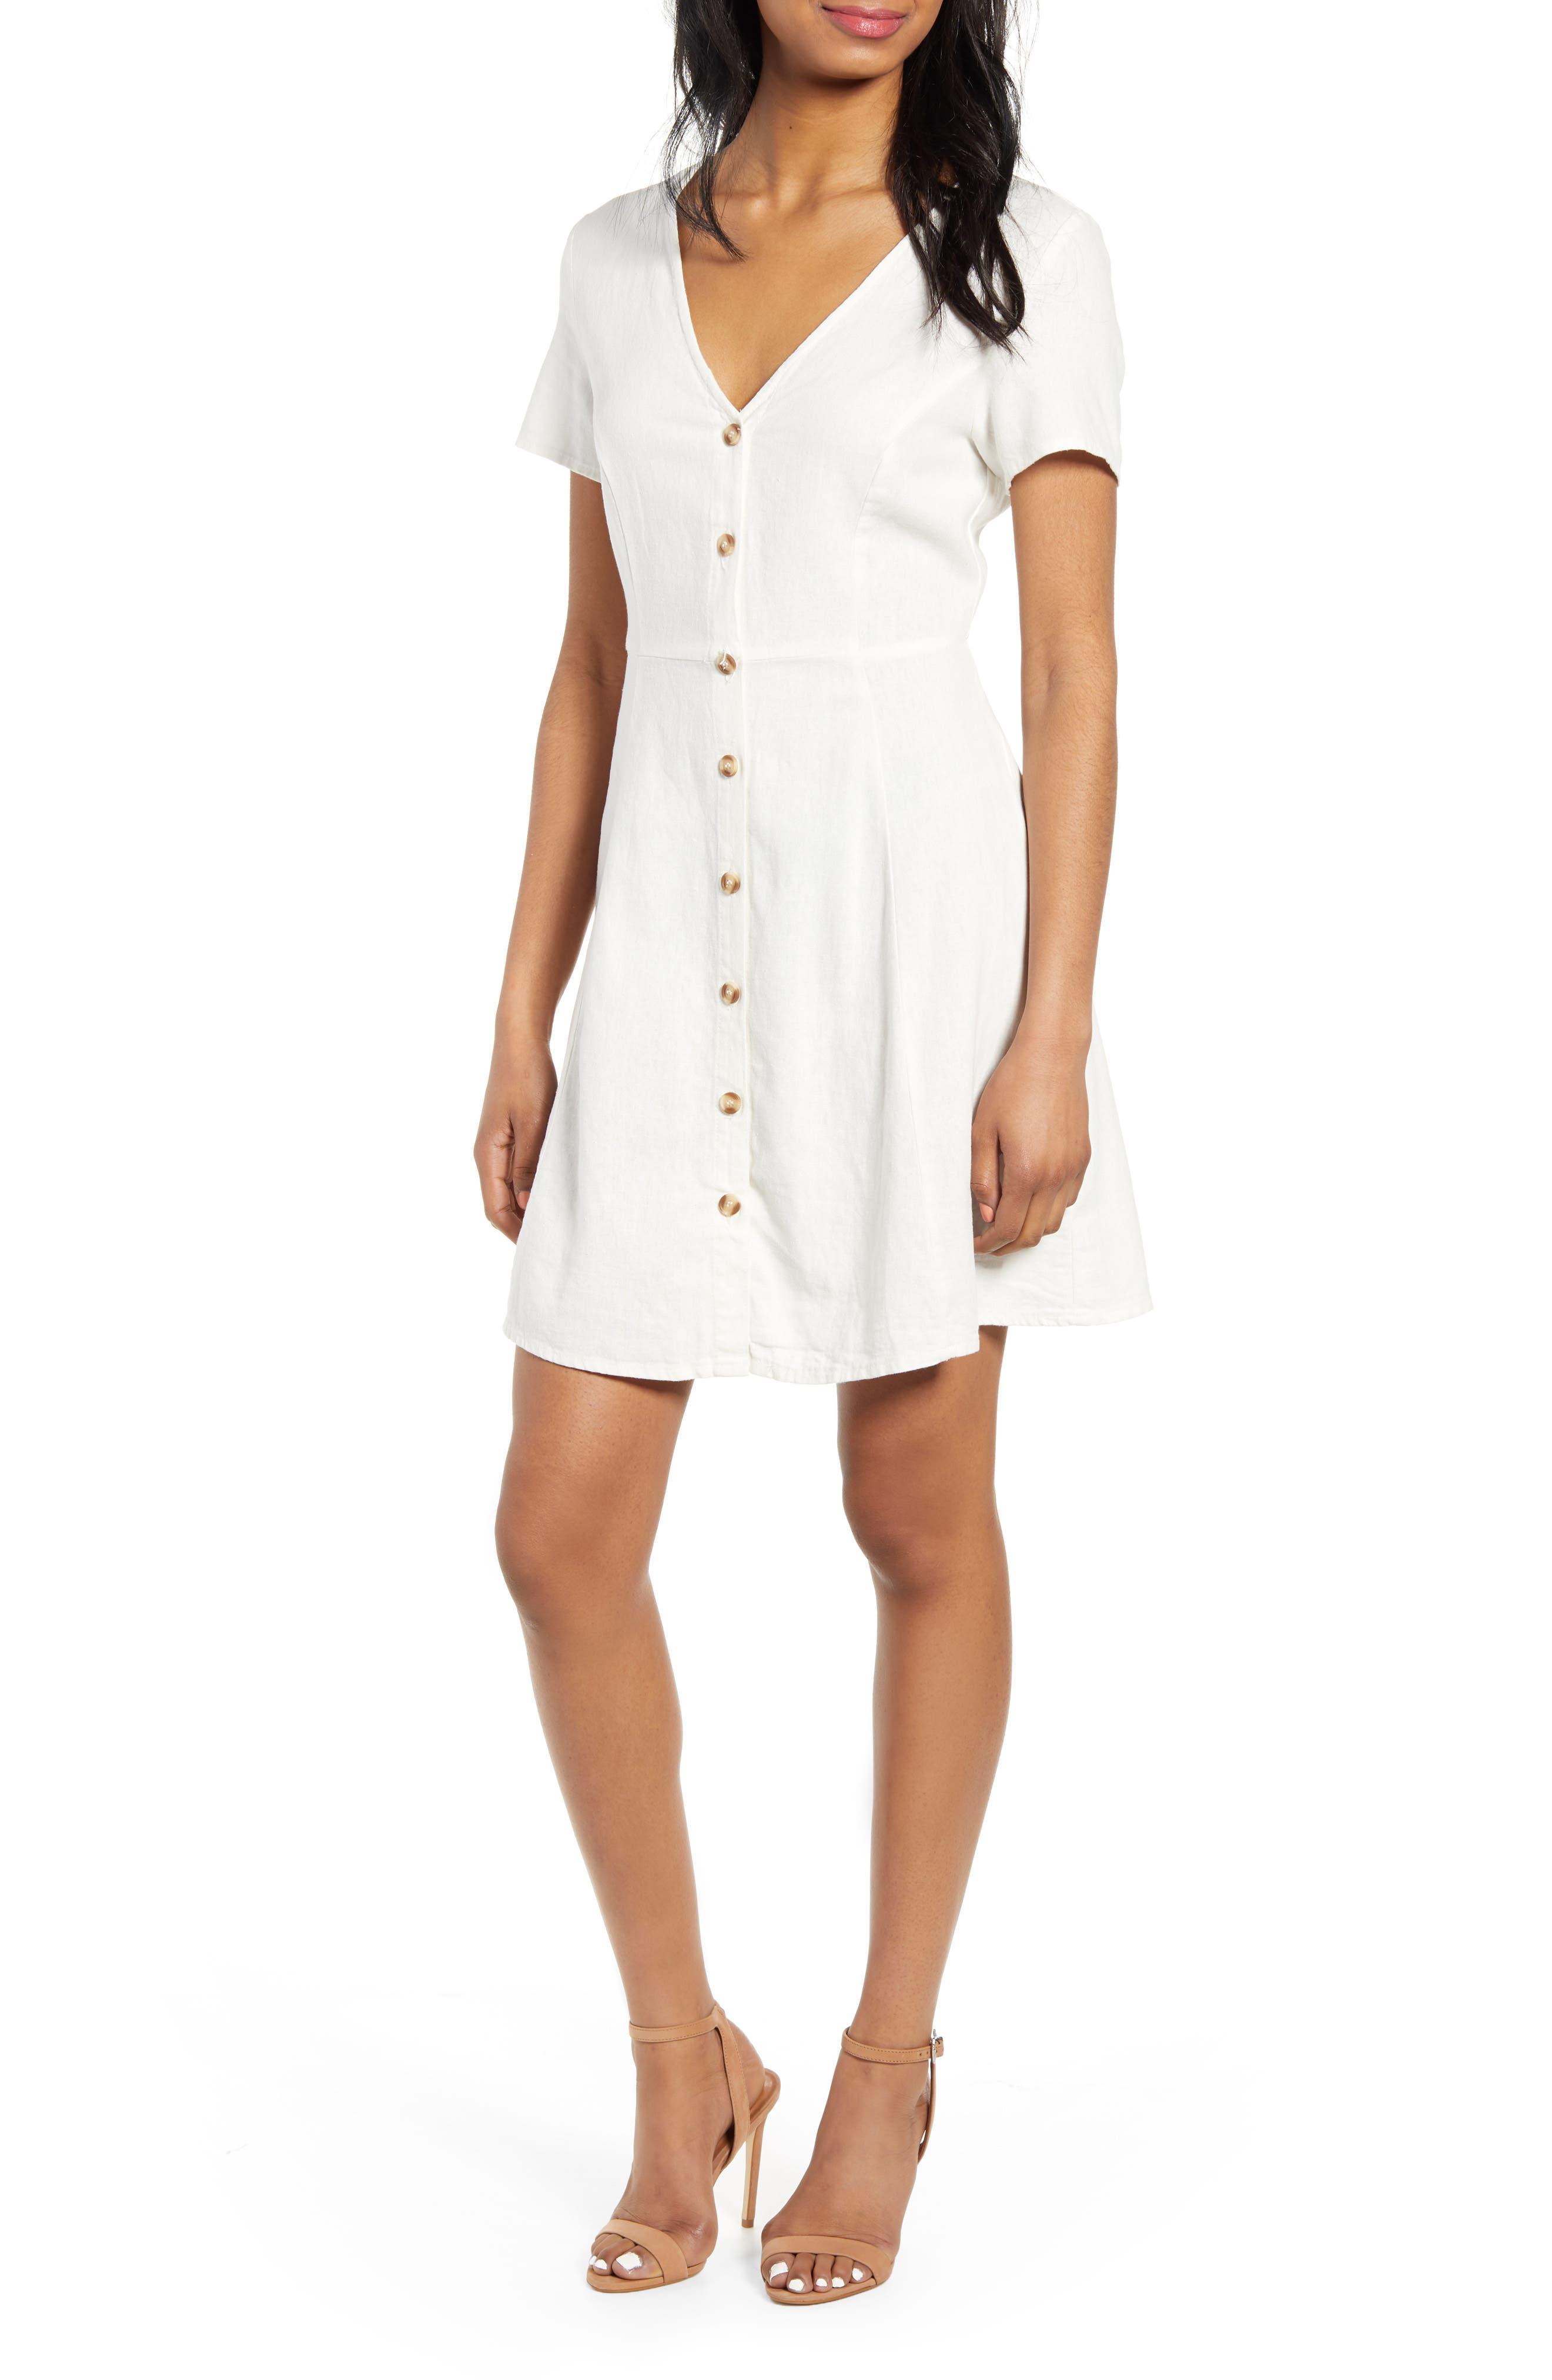 Vero Moda Anna Button Through Fit & Flare Dress, White